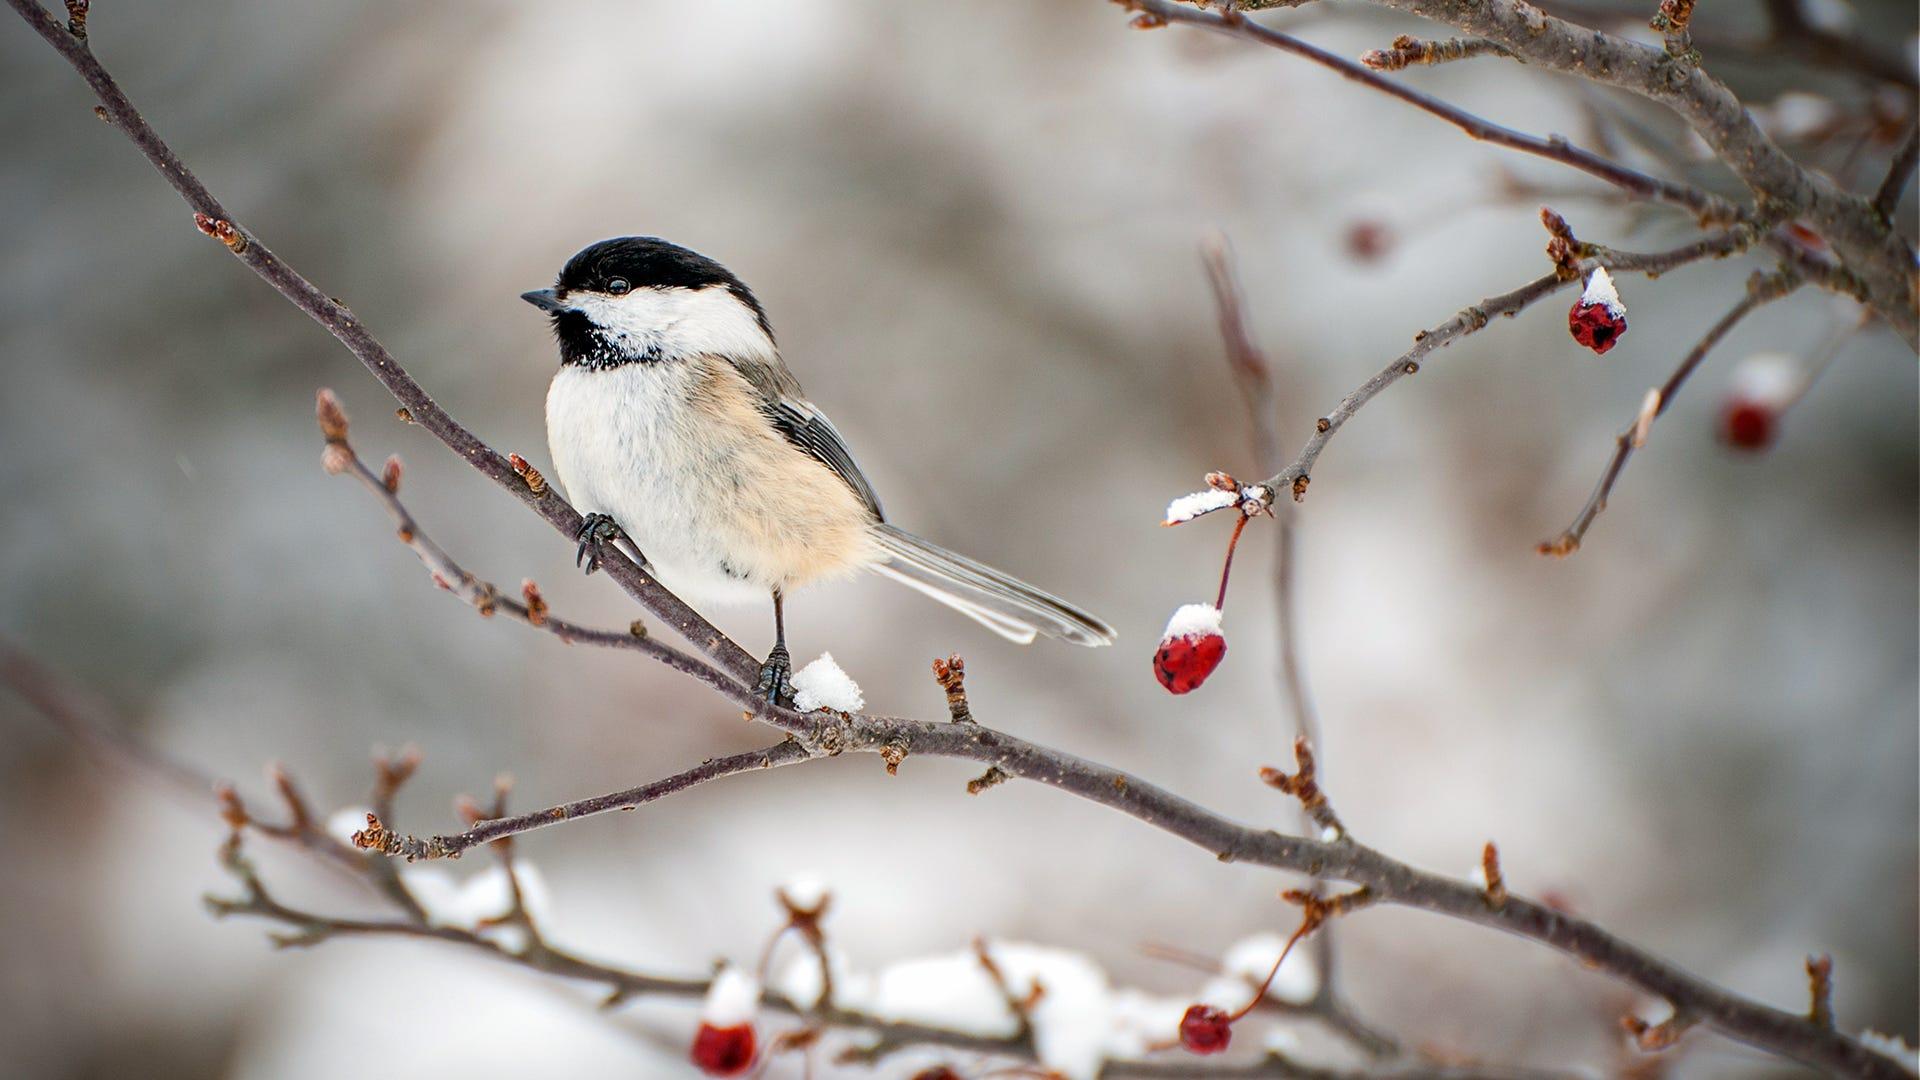 Holiday Bird Feeding: Treating Birds to A Winter Feast